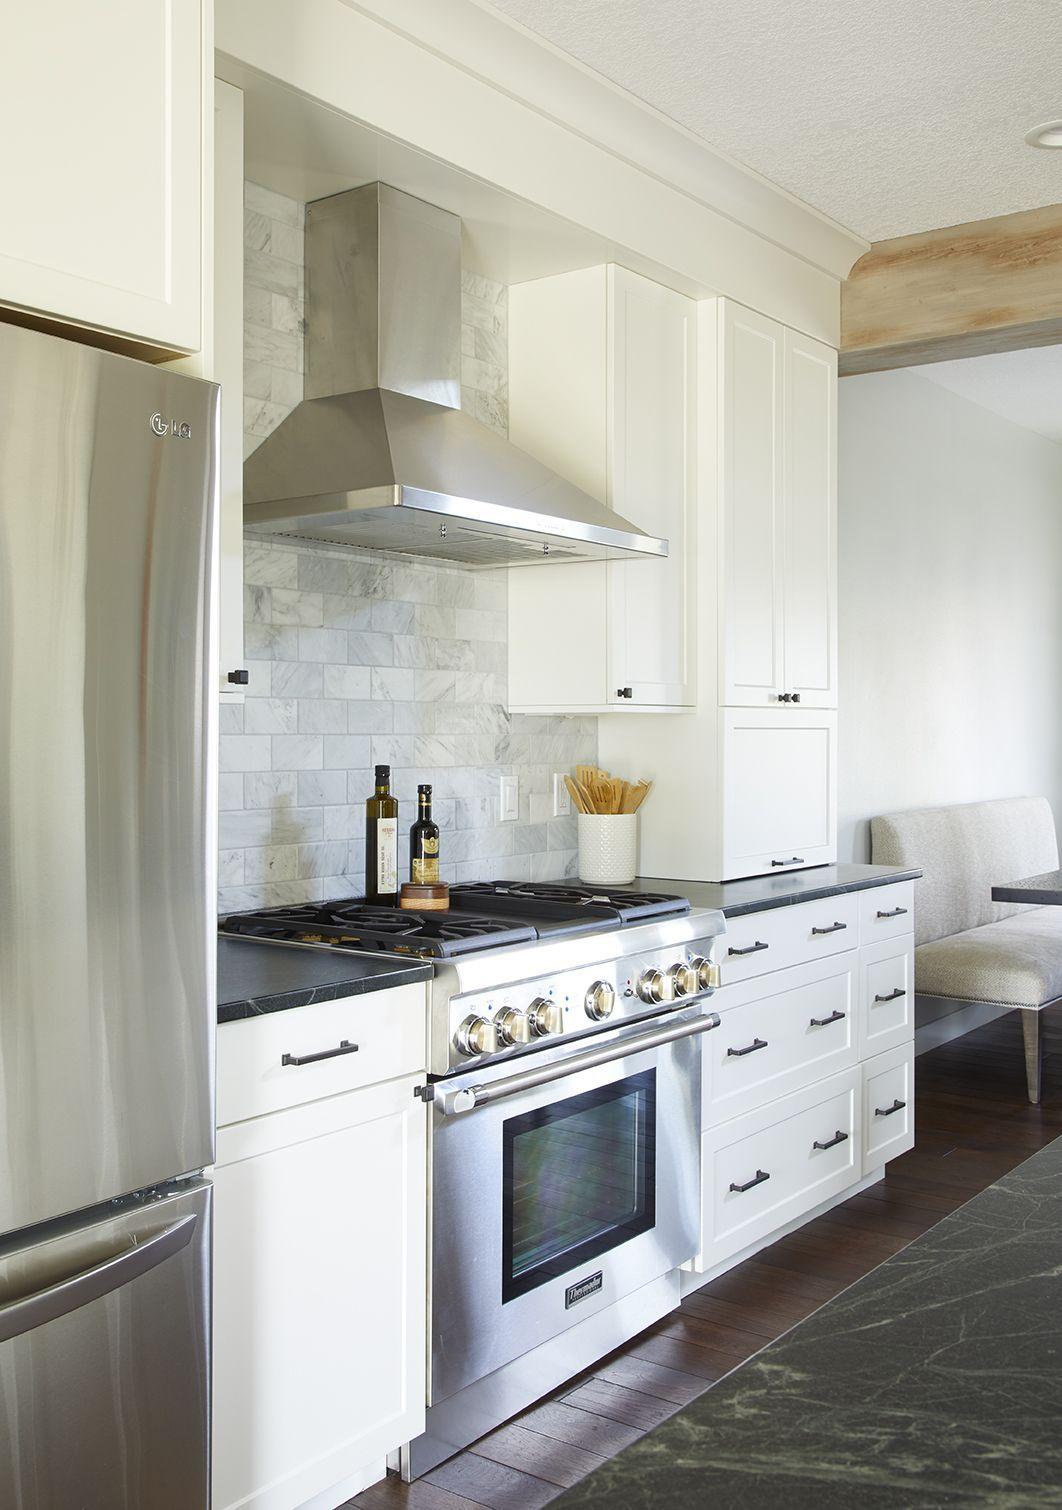 stupendous ideas metal backsplash wood countertops peel and stick